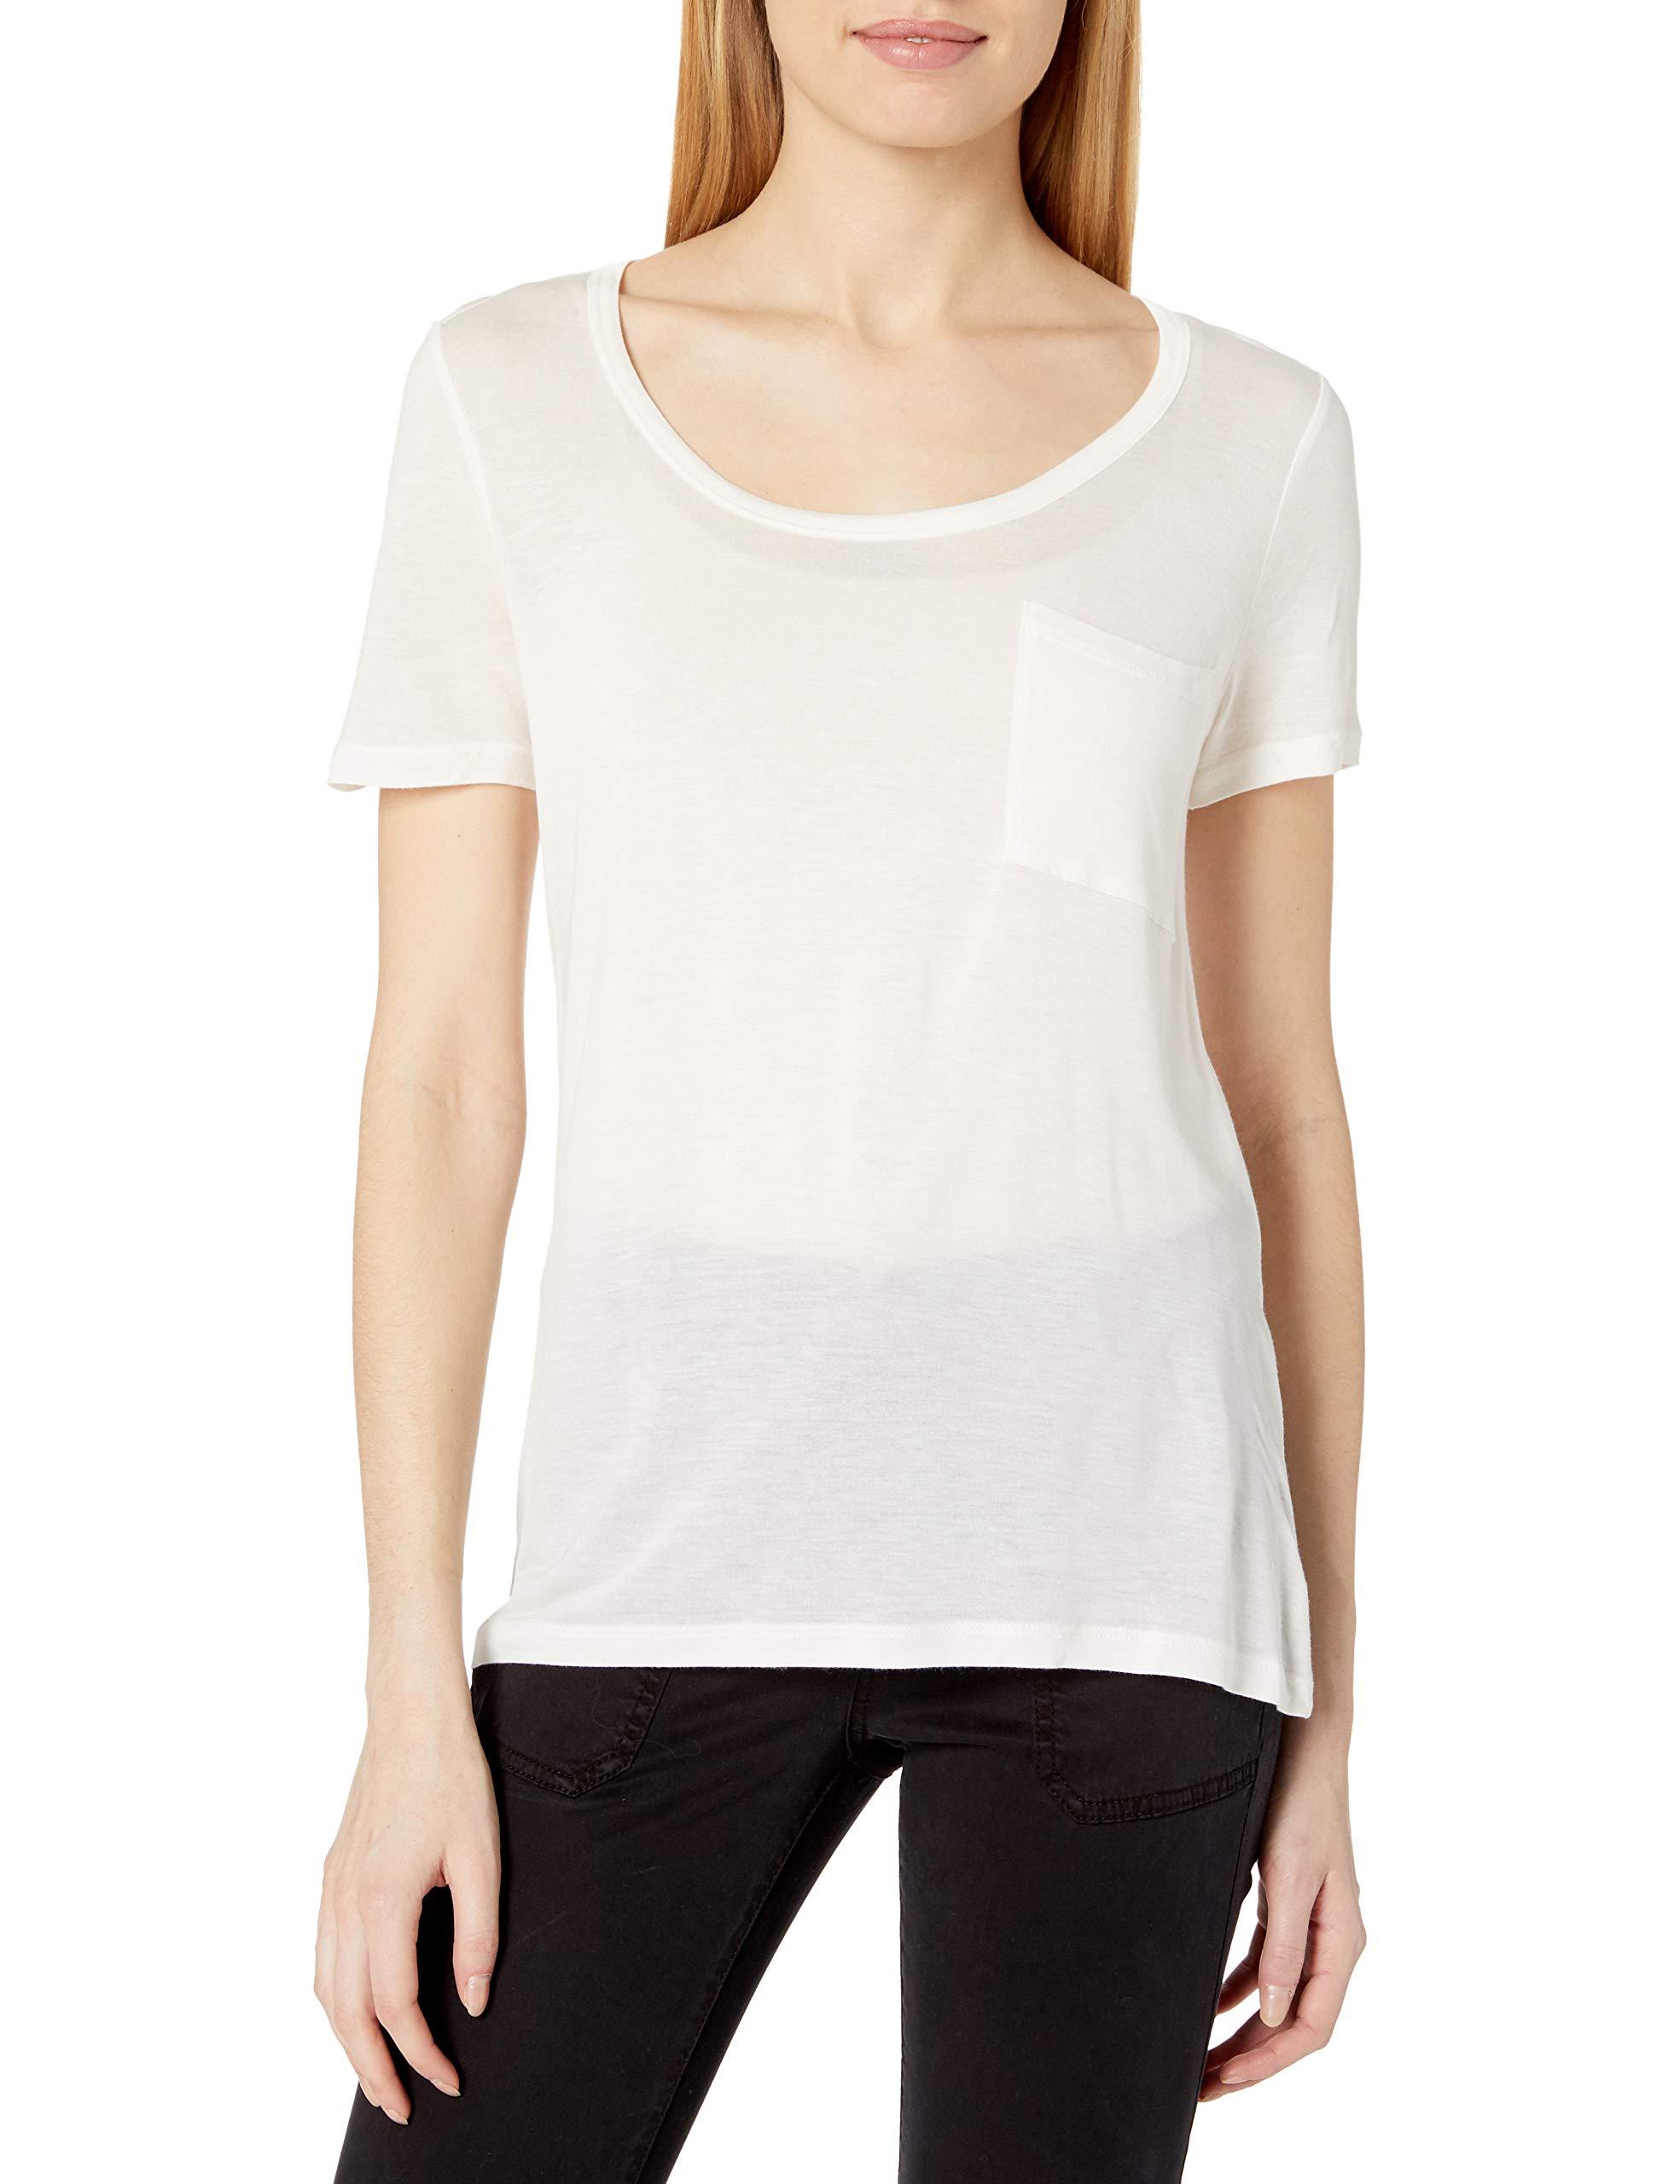 Amazon Brand - Daily Ritual Women's Super Soft Modal Semi-Sheer Pocket T-Shirt